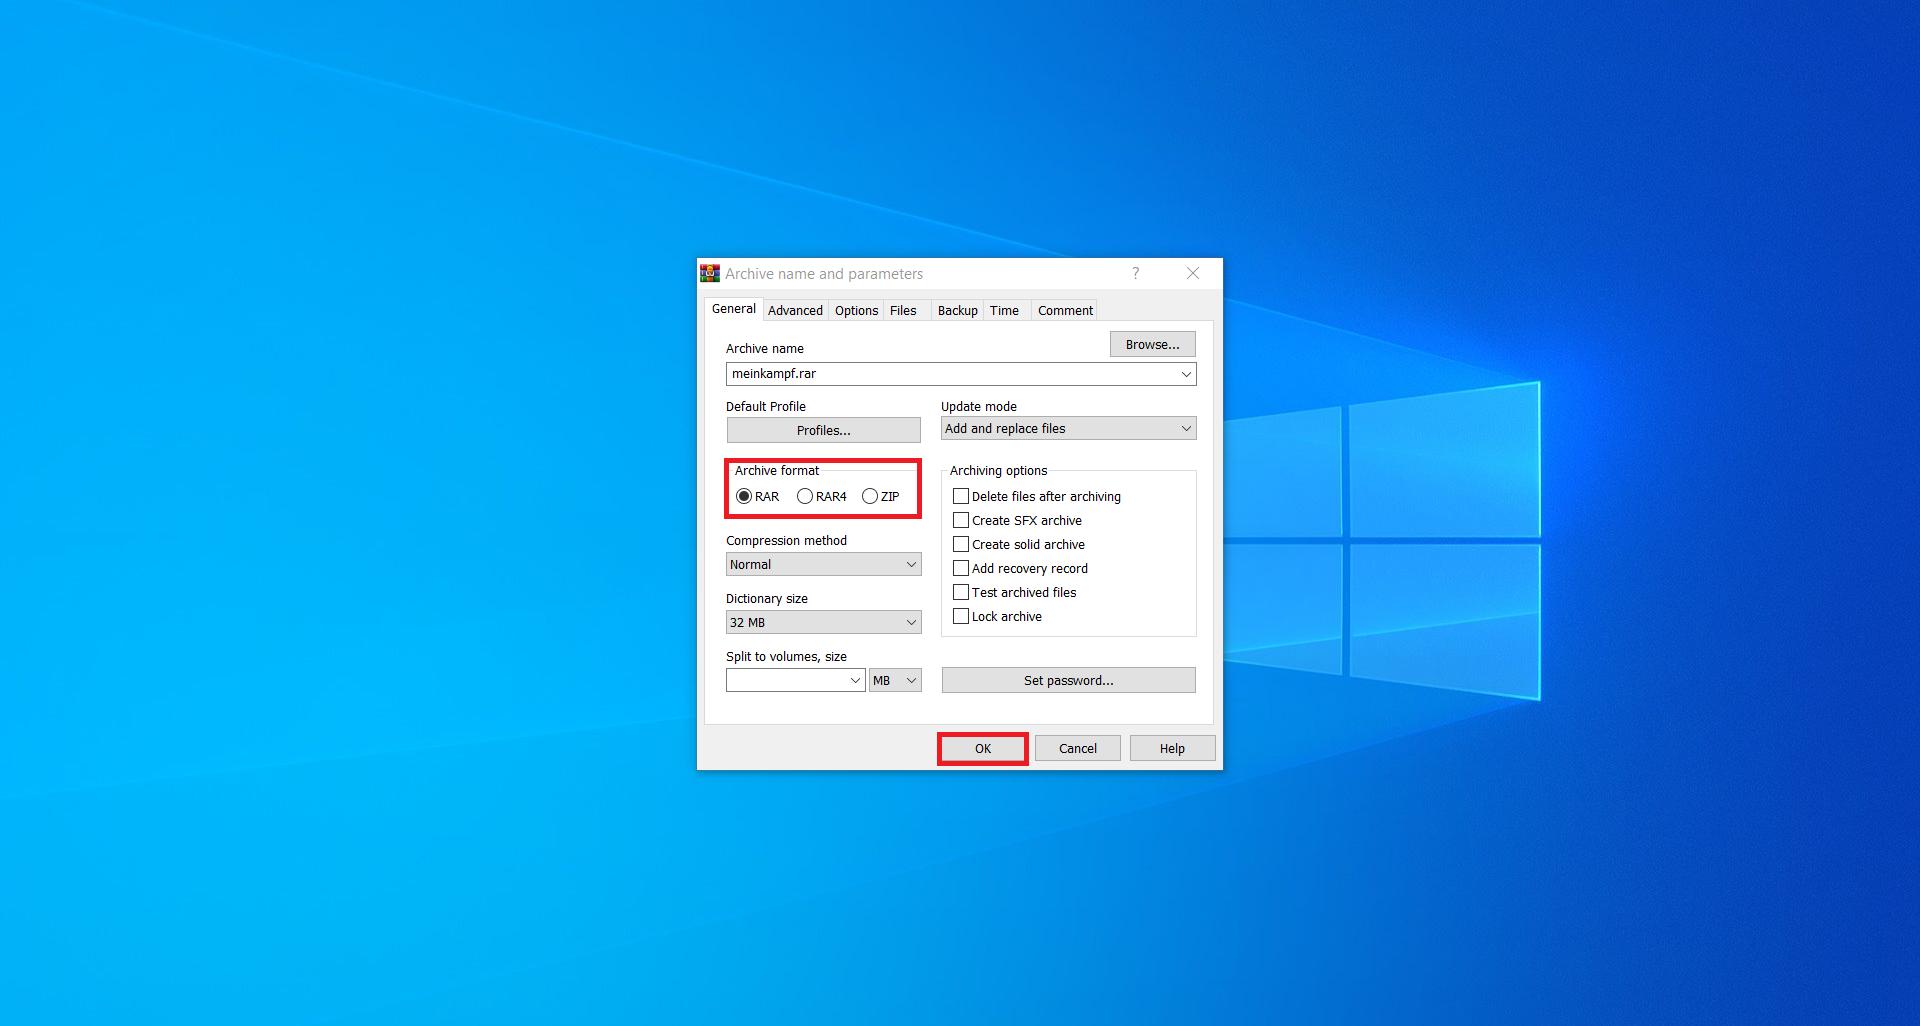 How to convert EPUB to RAR files using WinRAR?